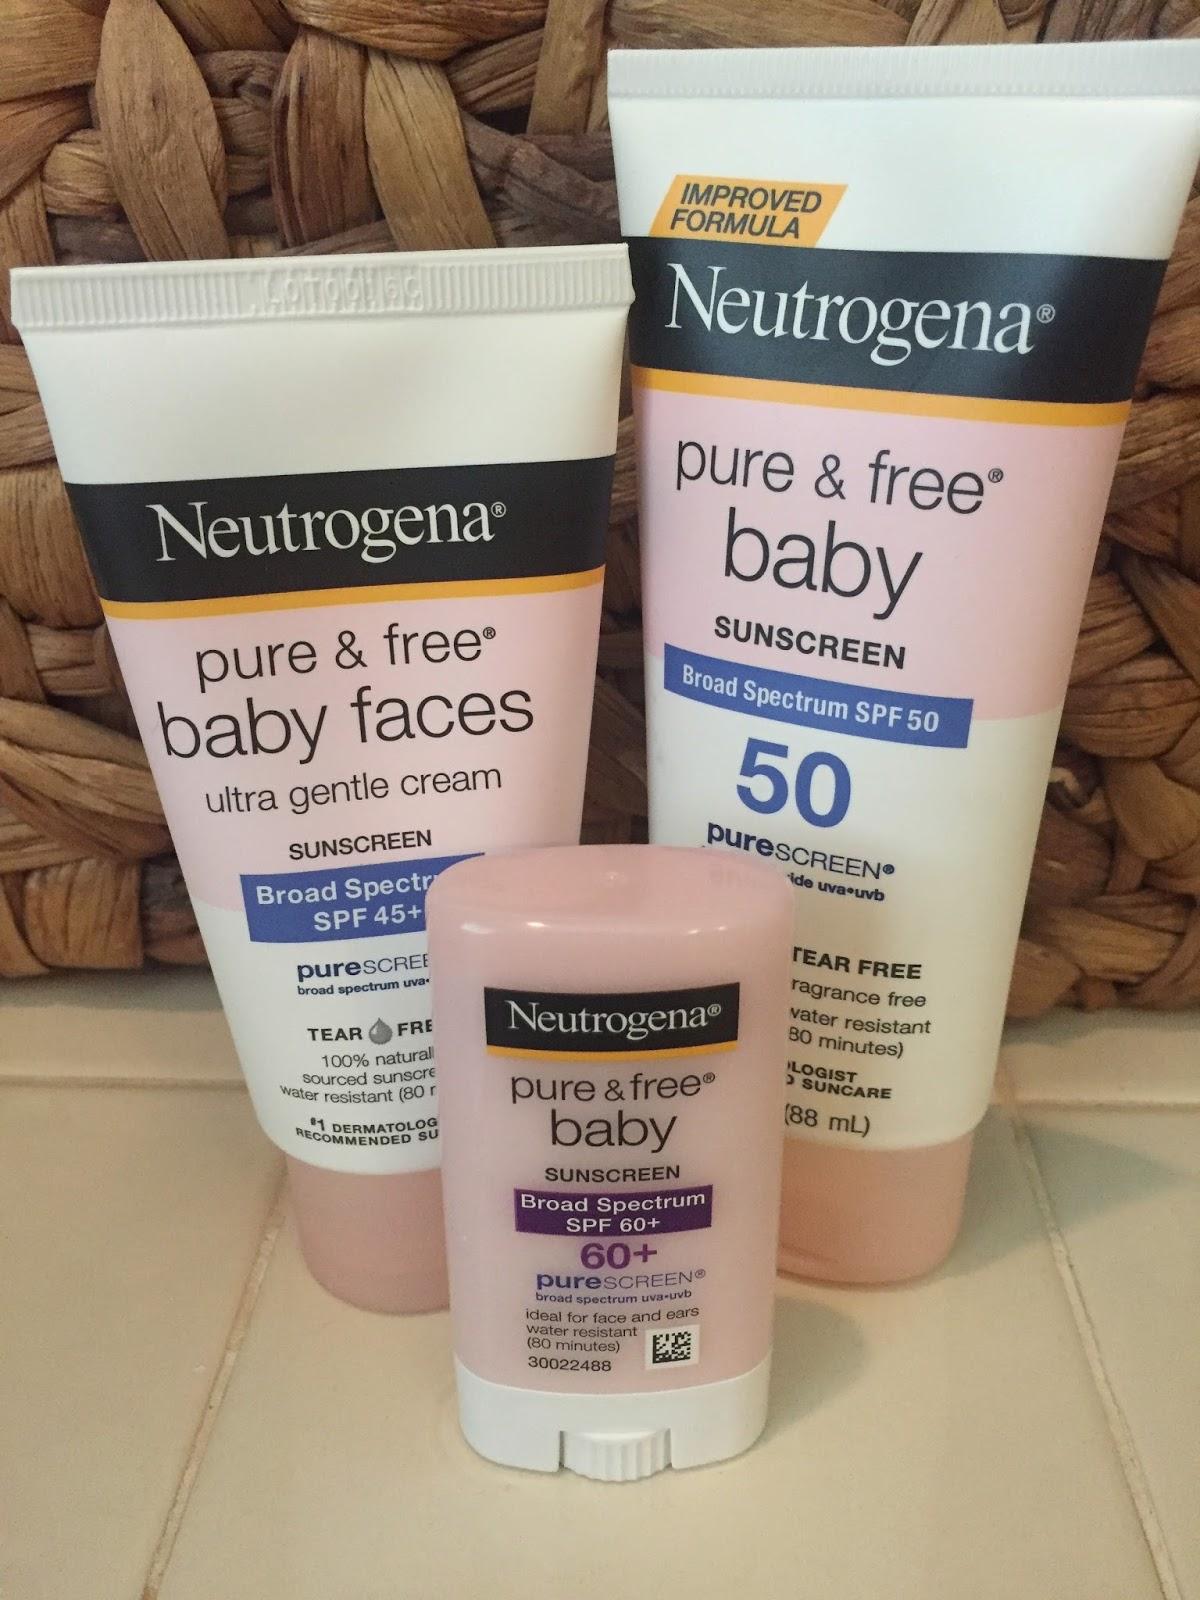 pammy blogs beauty  live a sun safe life  cvs long live skin campaign with neutrogena and the